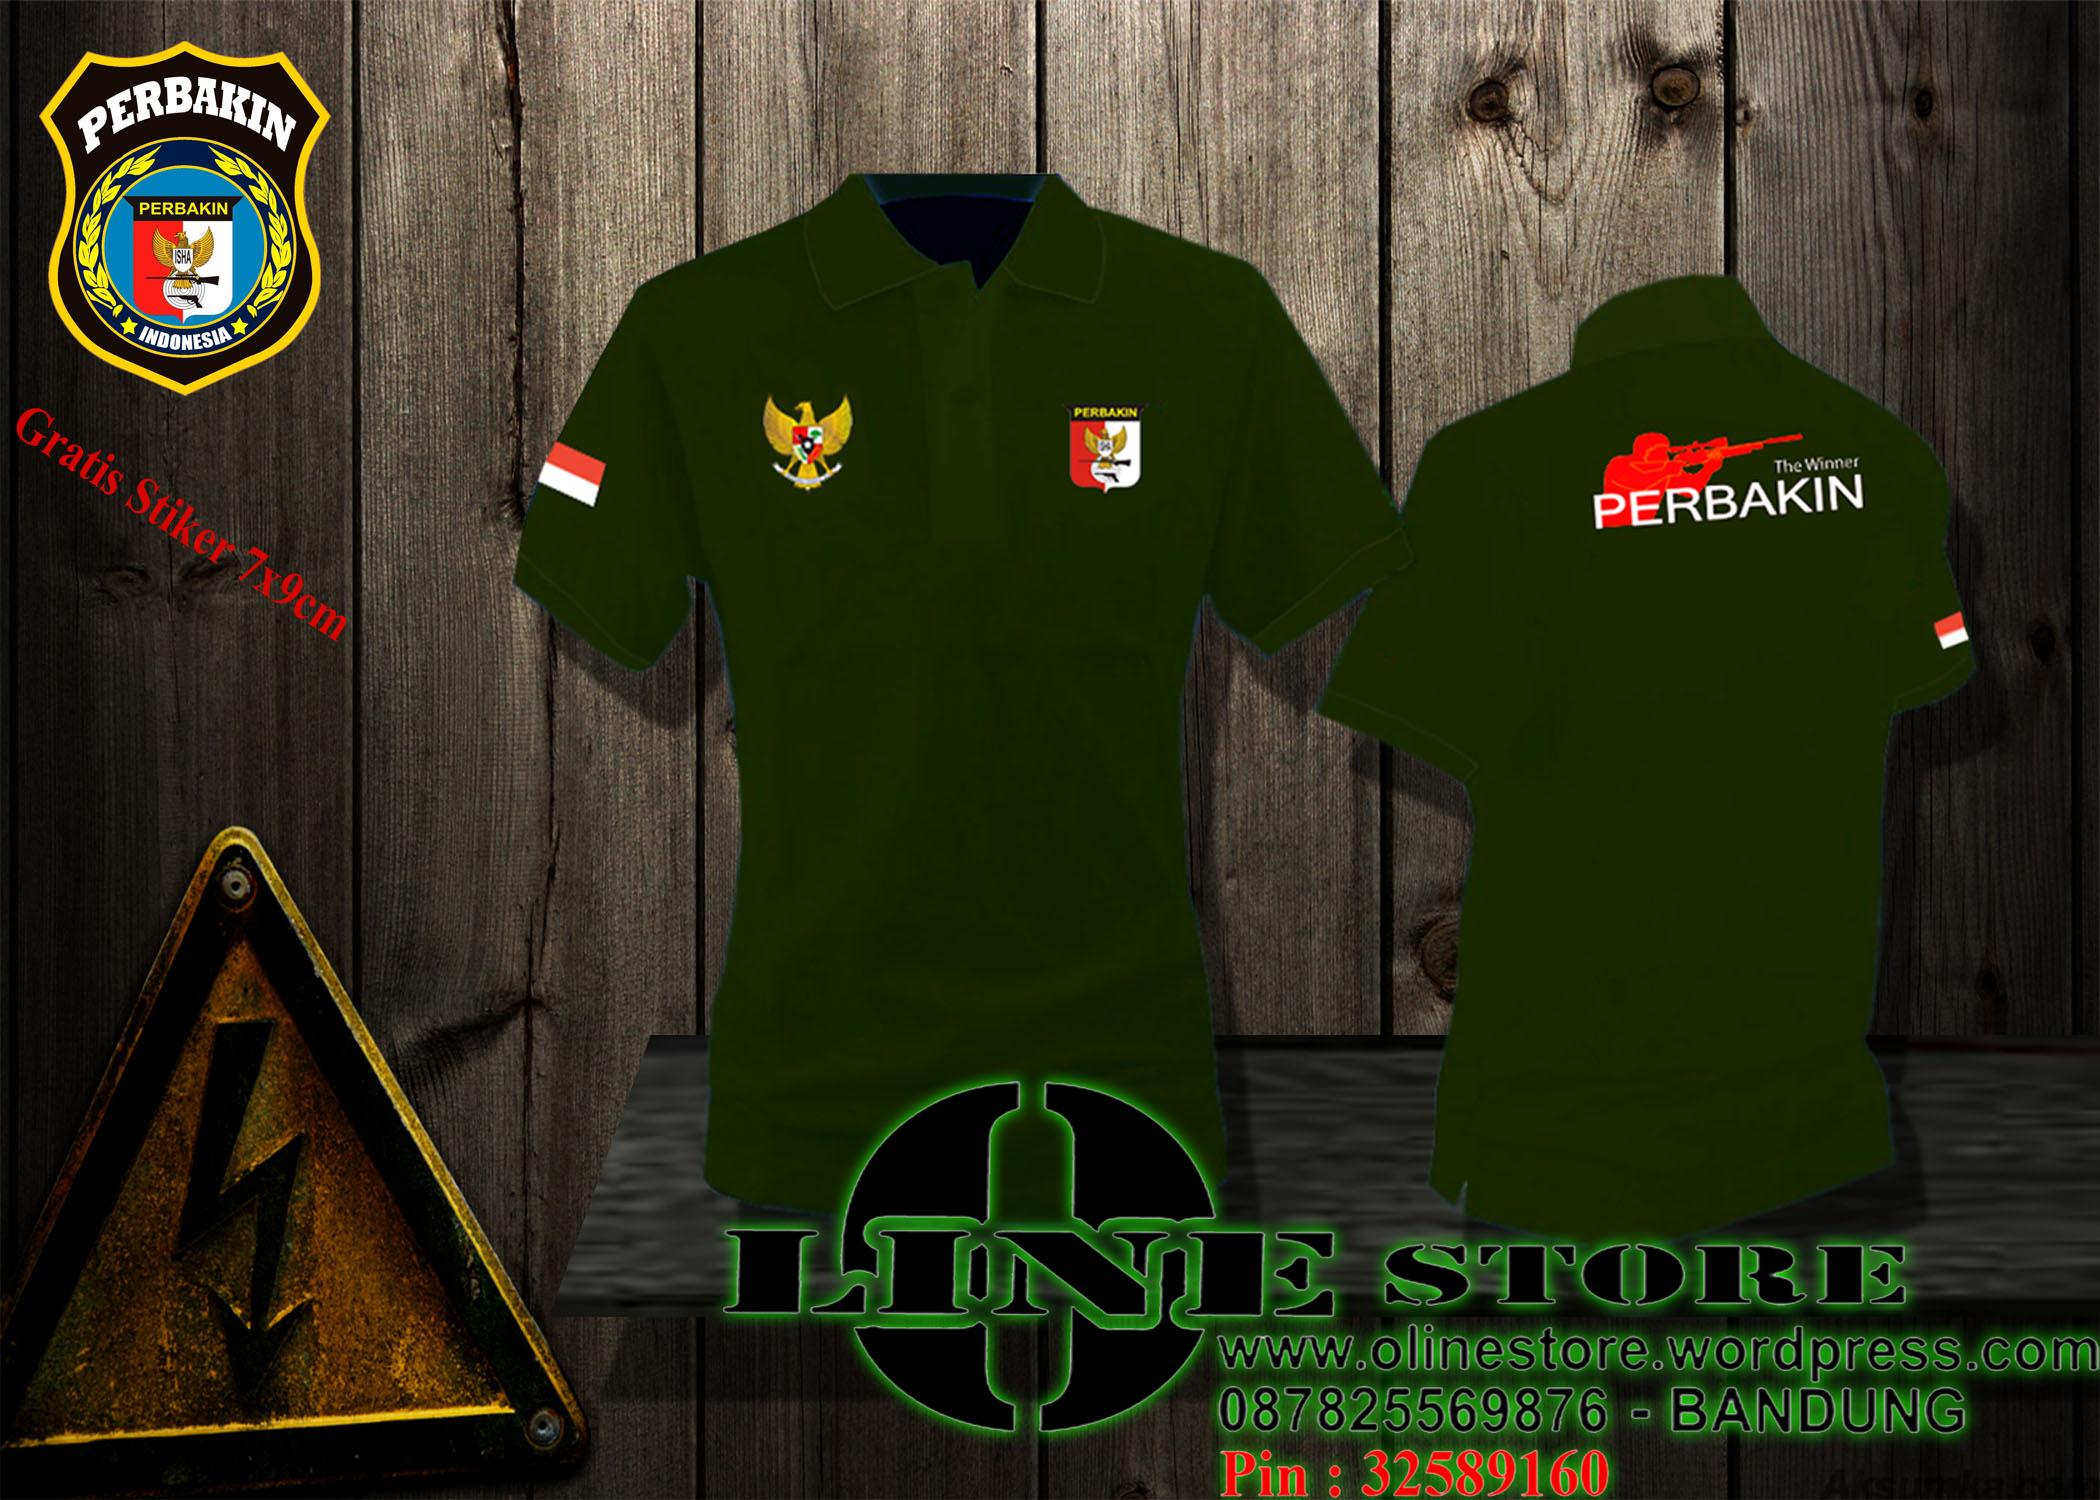 Hijau Army O Line Store Productions Kaos Polo Perbakin Shirt Jual Baju Kemeja Jaket Poloshirt Katalog Ready Stock